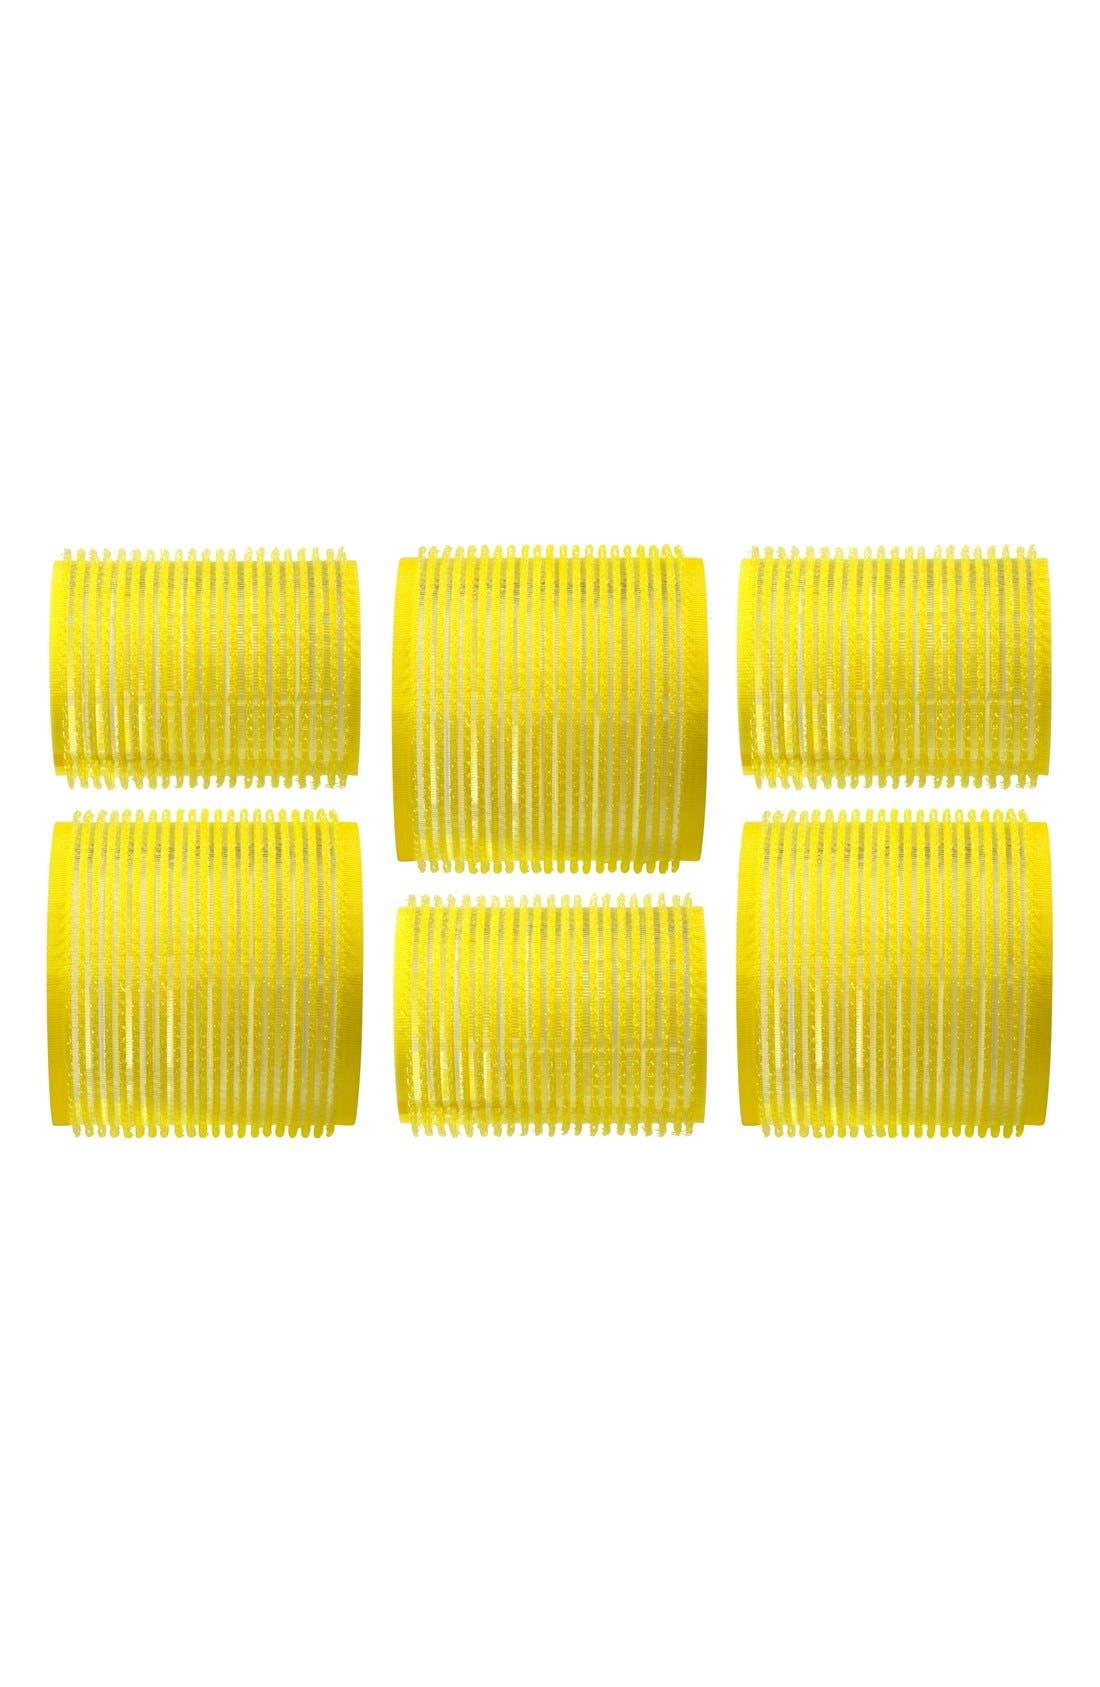 Main Image - Drybar 'High Tops' Self-Grip Rollers